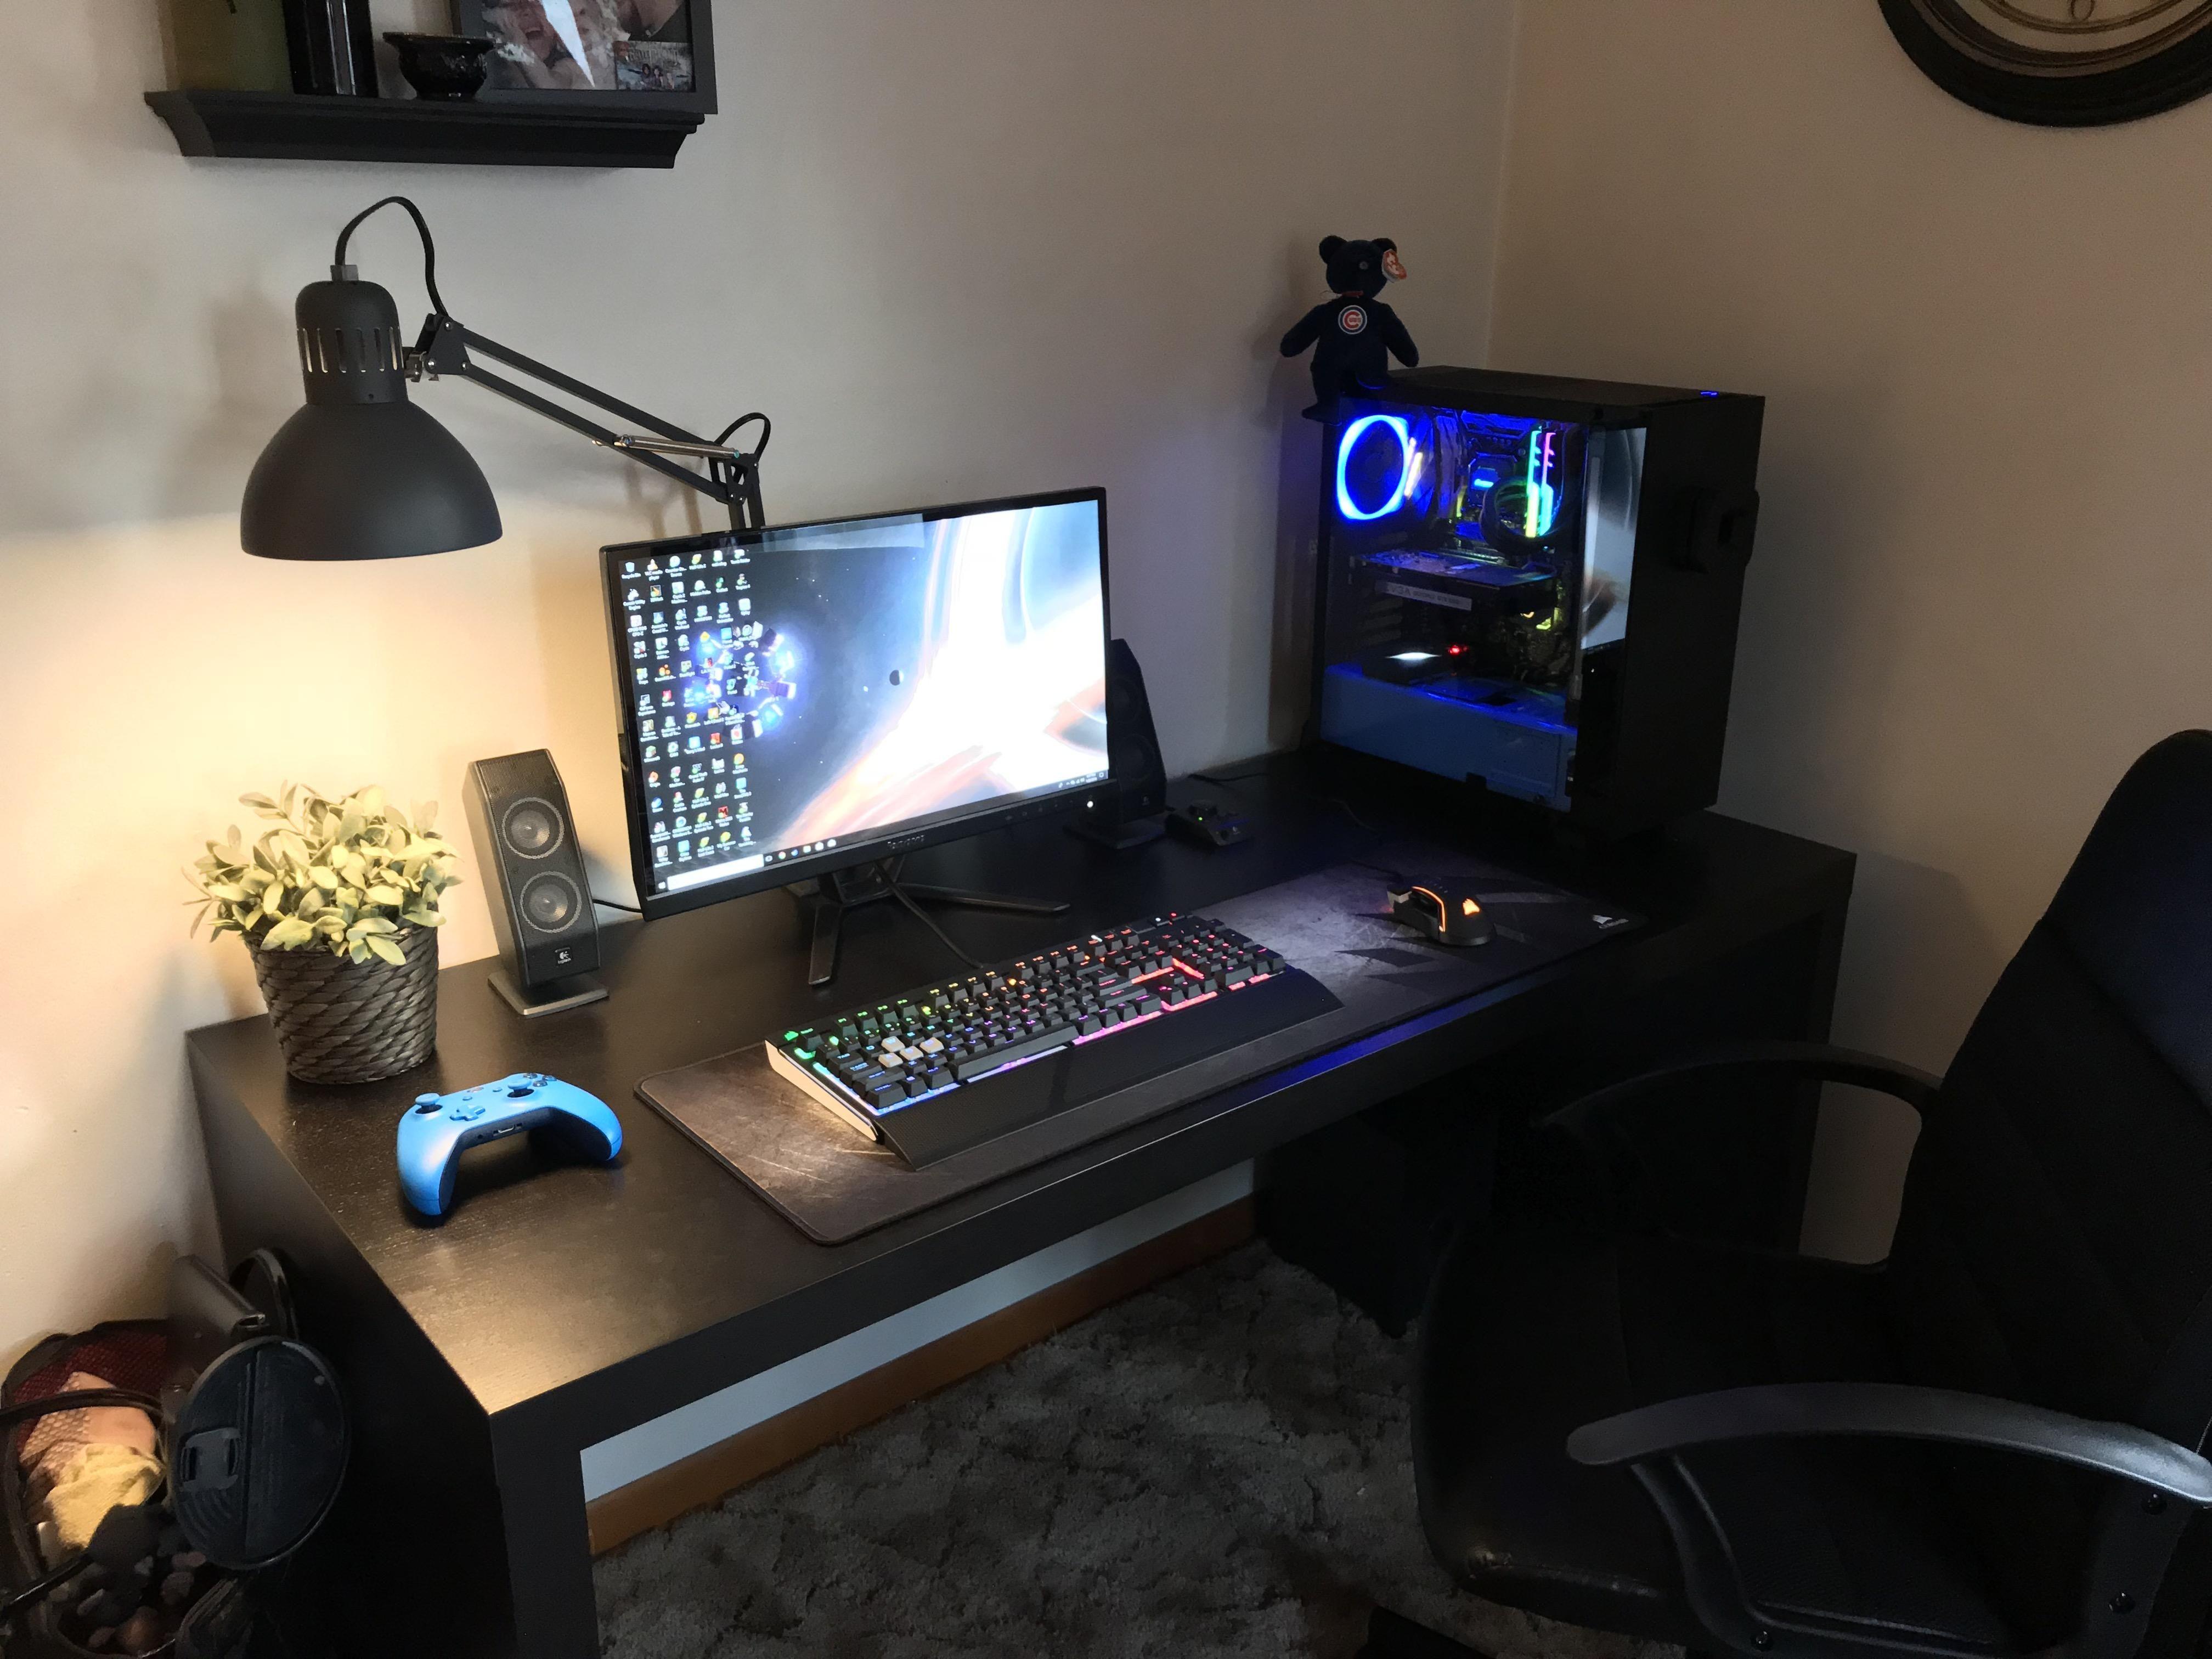 amazing office desk setup ideas 5. Microcenter And Ikea Are My Weakness. Amazing Office Desk Setup Ideas 5